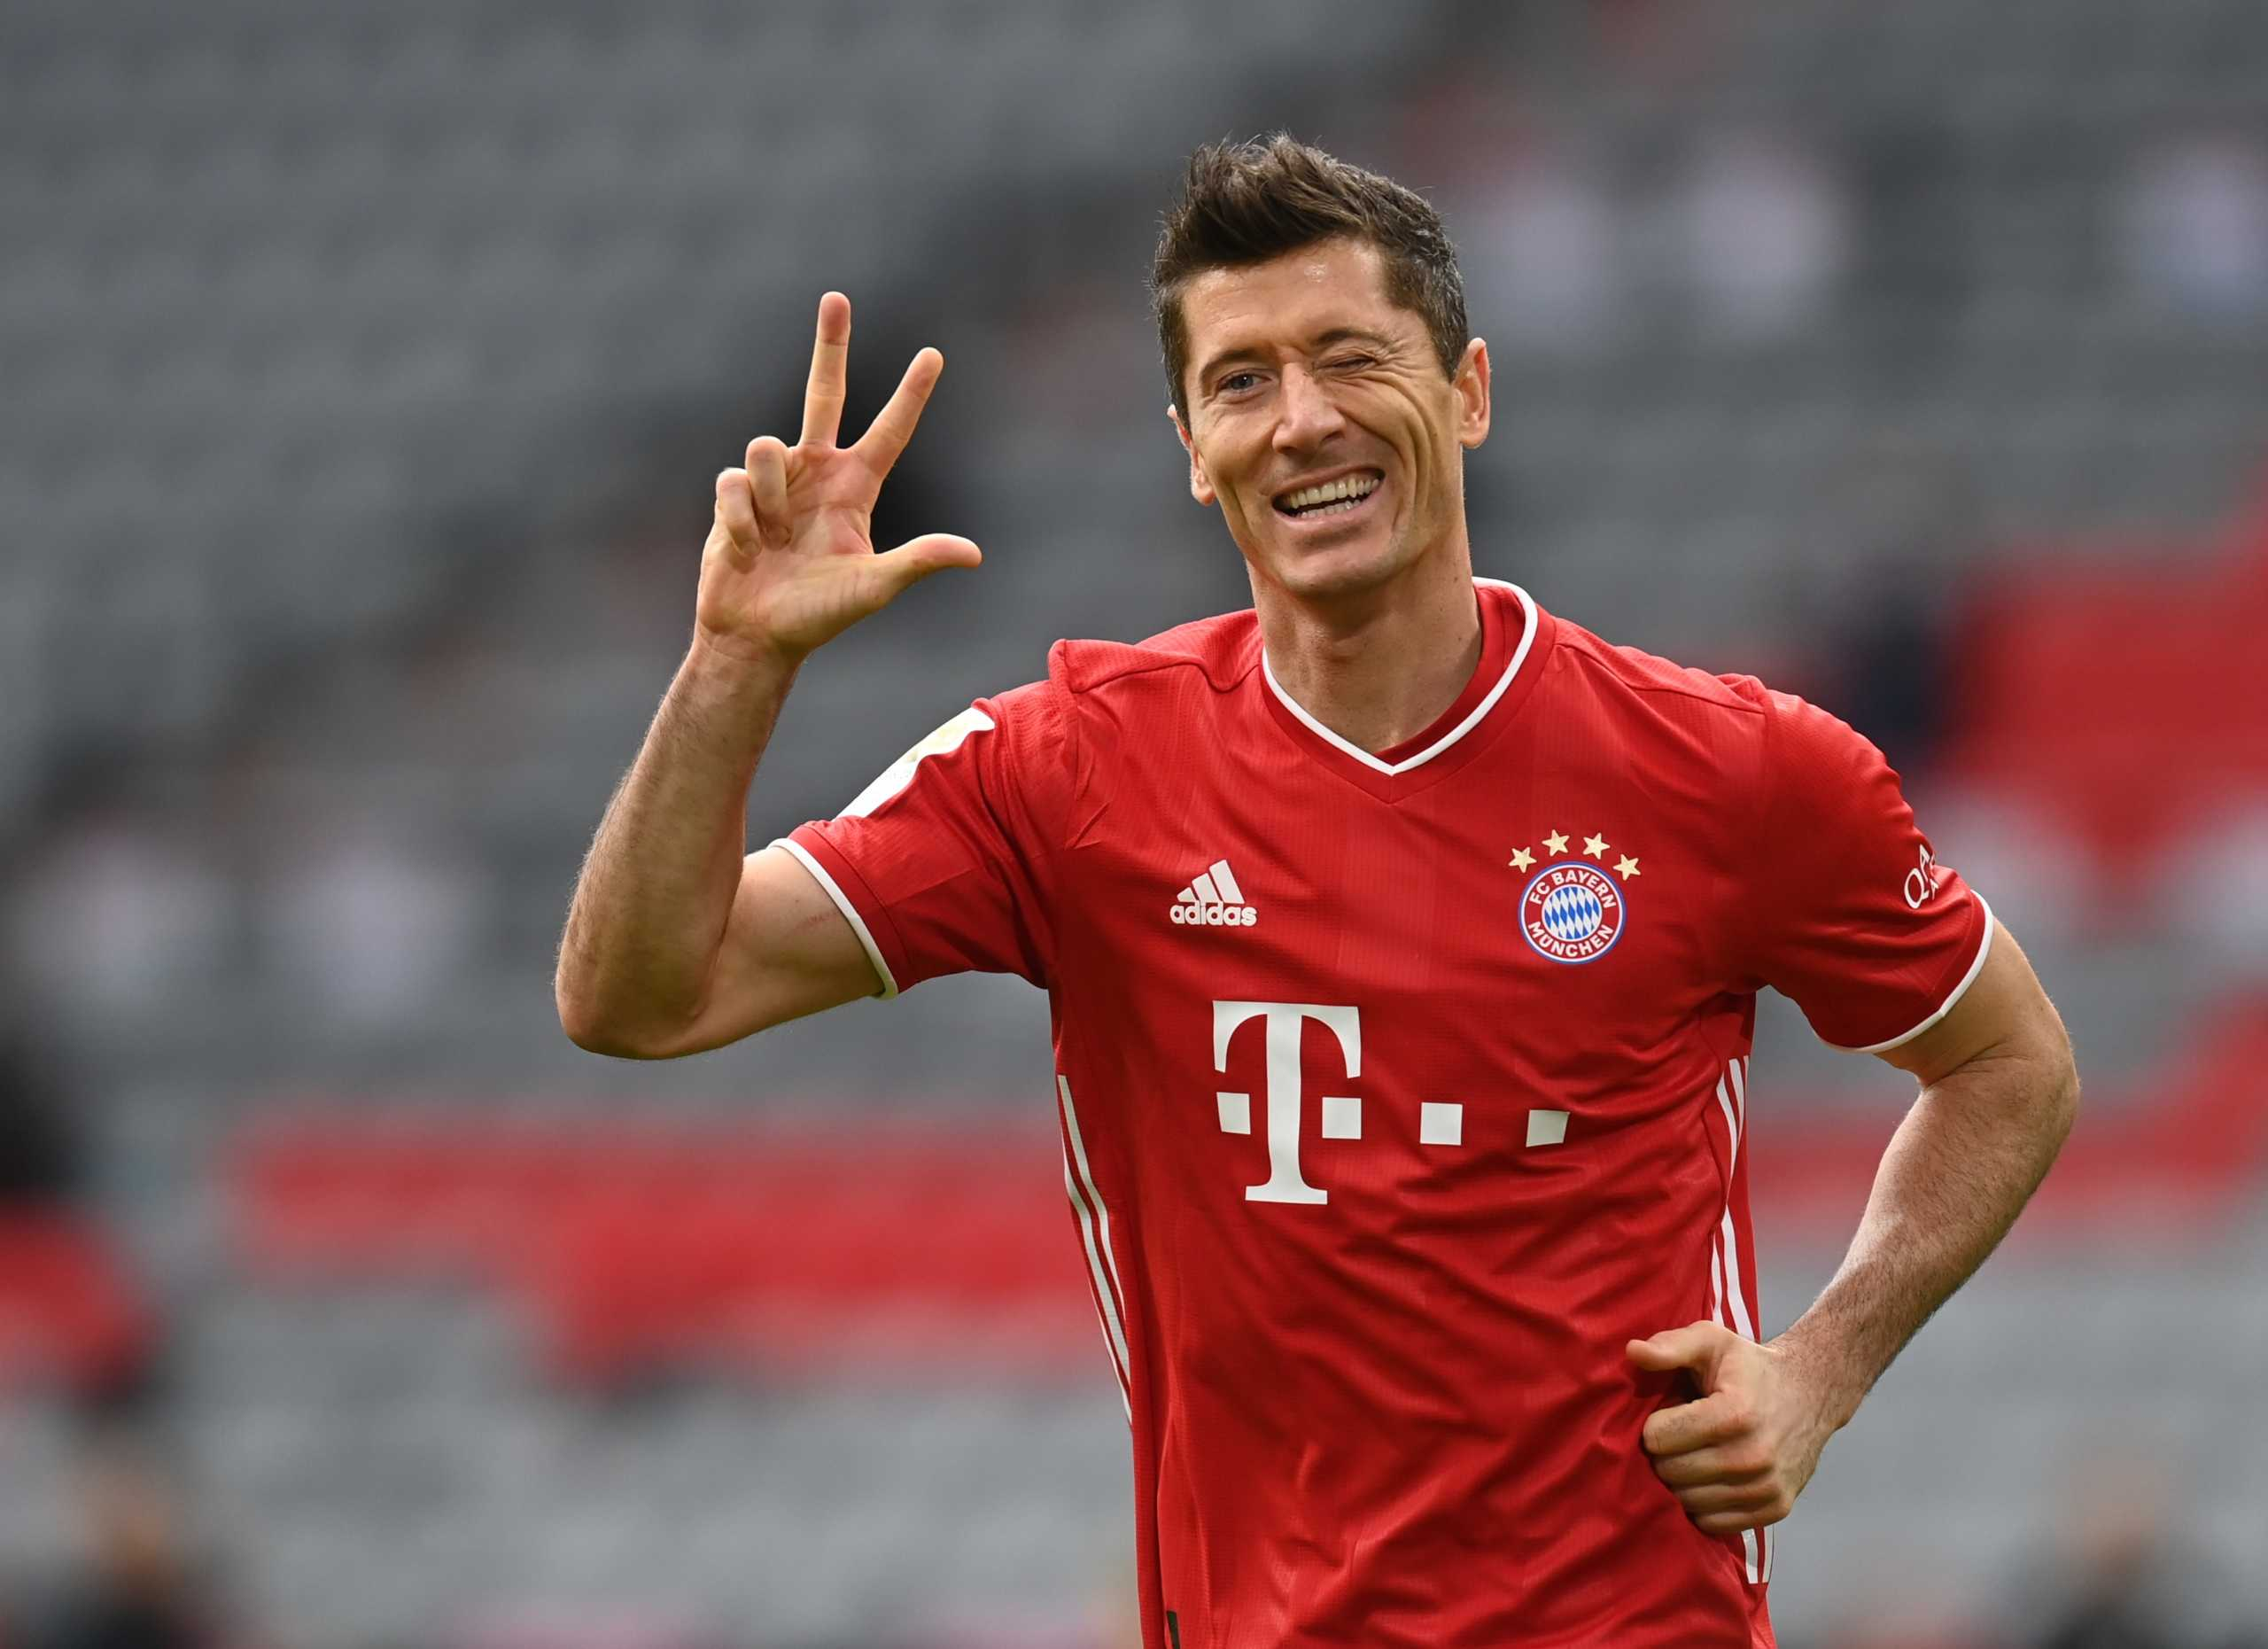 Bundesliga: Κορυφαίος παίκτης της σεζόν ο Λεβαντόφσκι